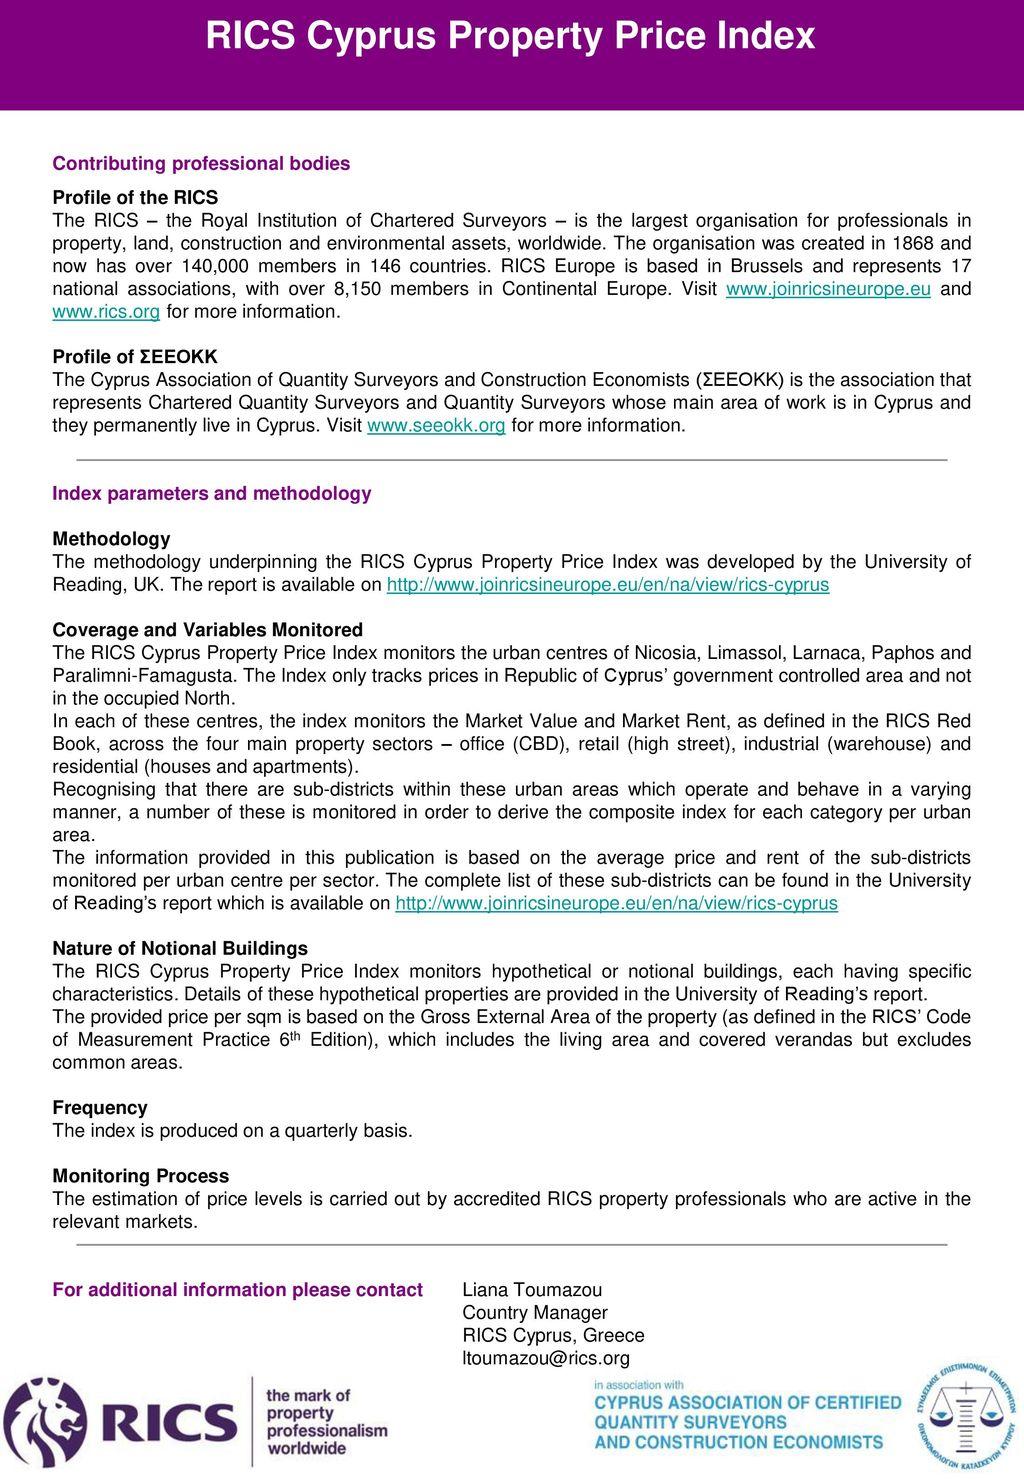 RICS Cyprus Property Price Index - ppt download